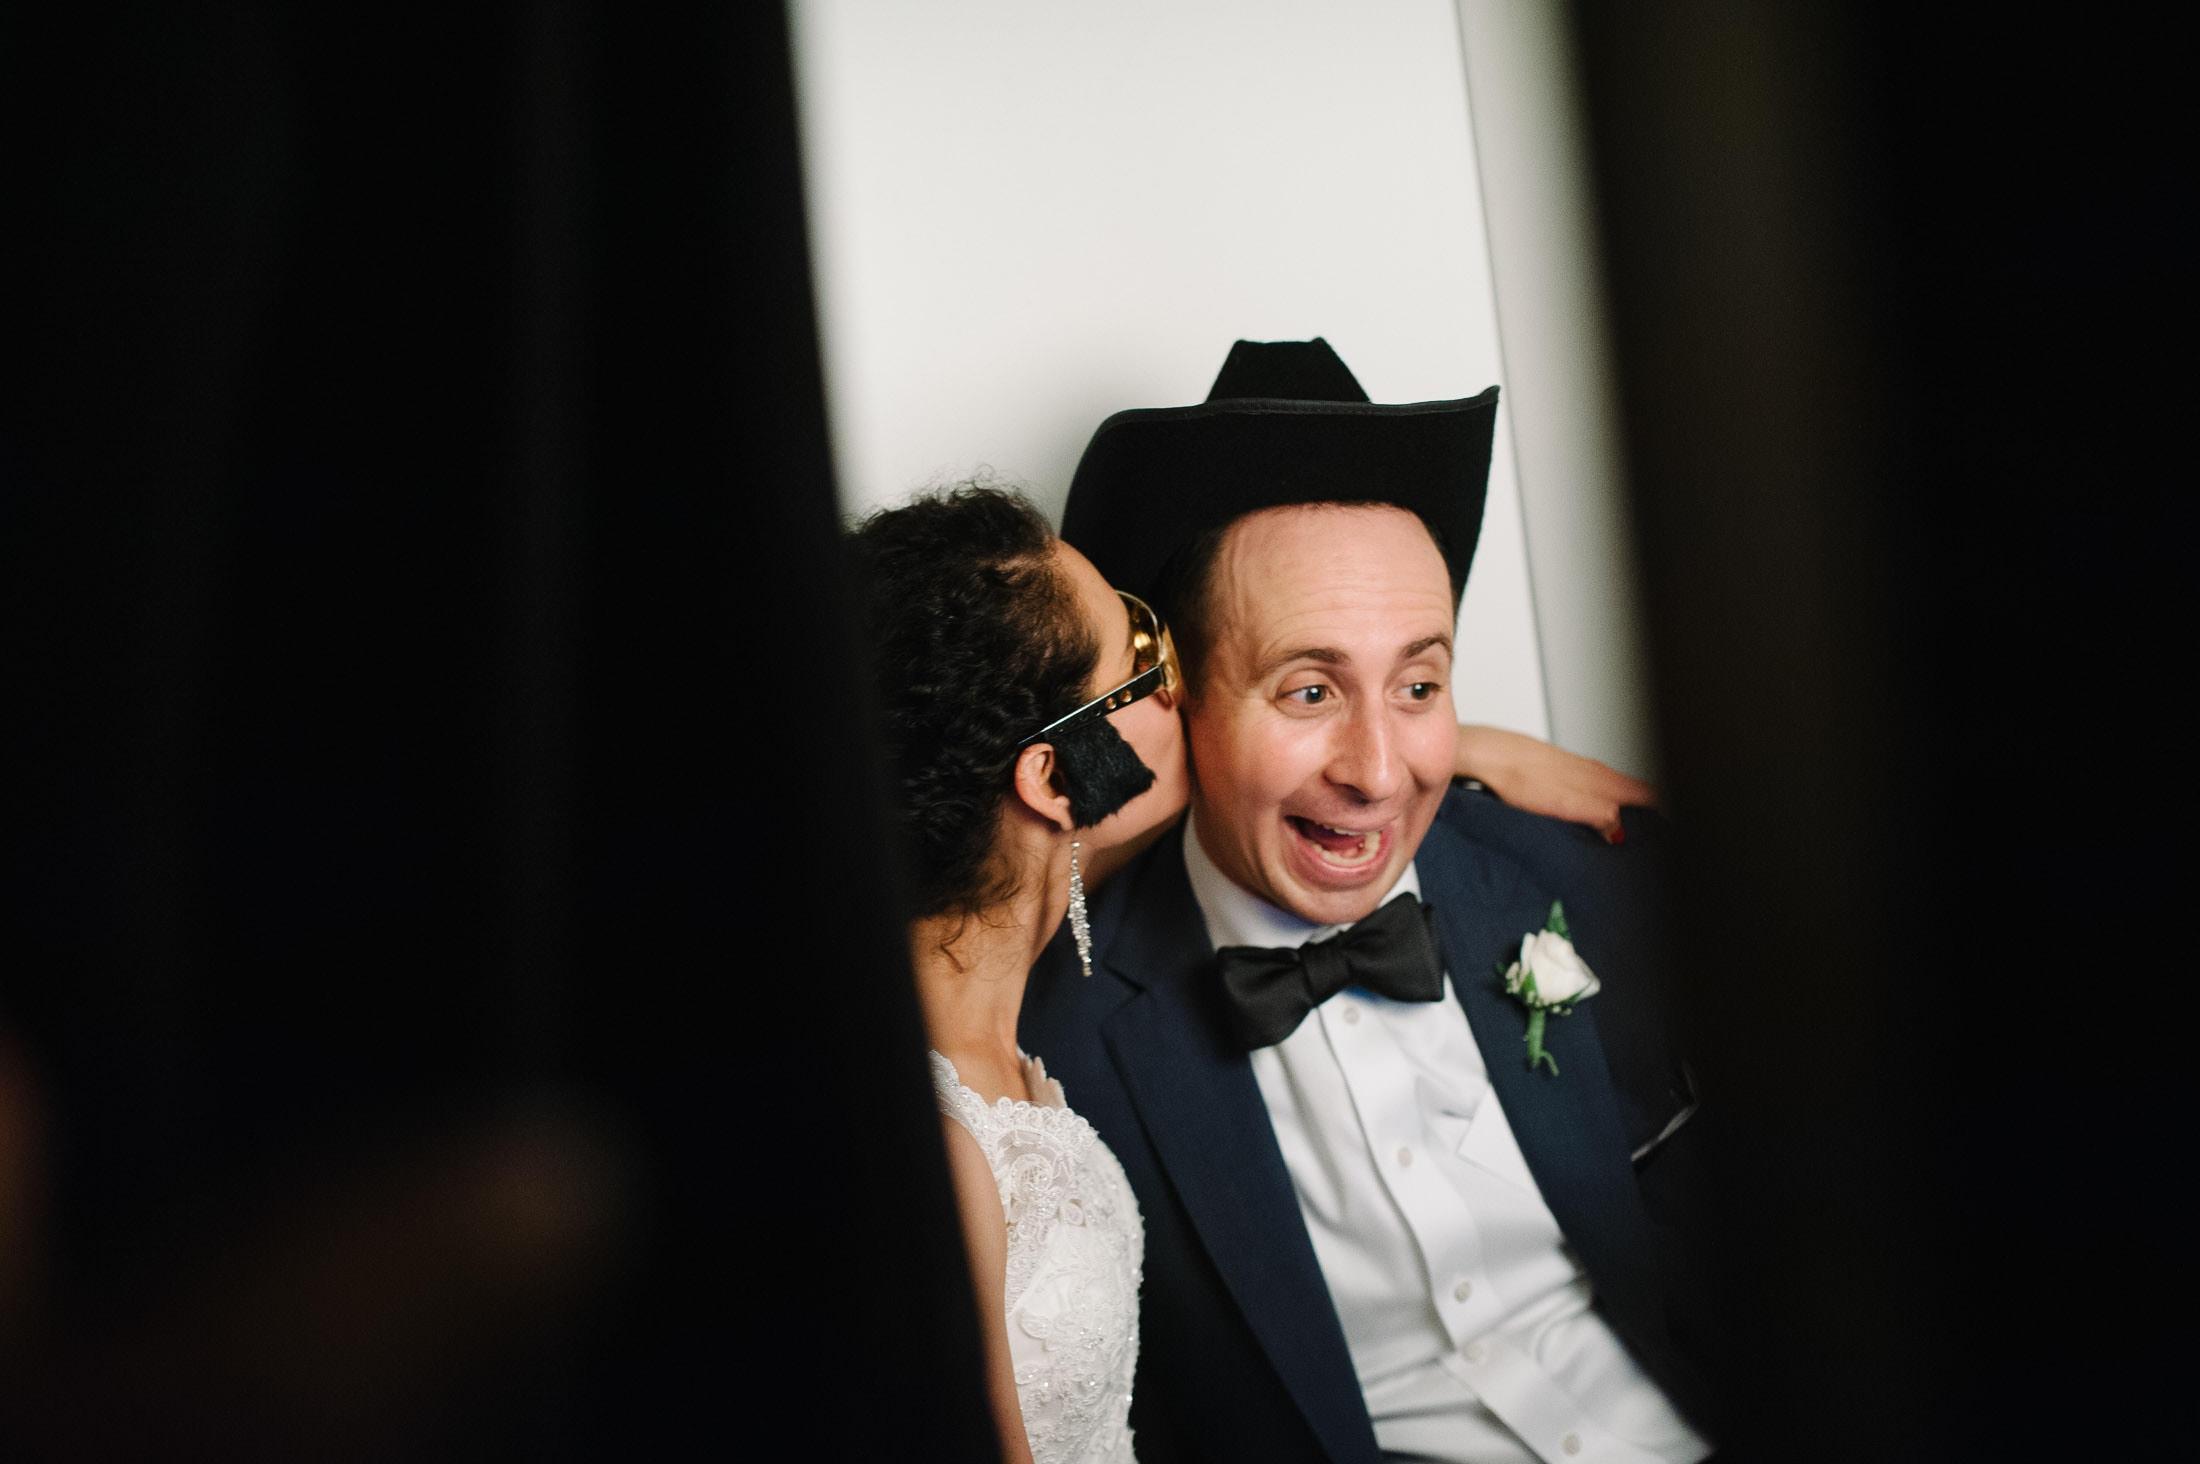 Photo Booth at Jewish Wedding at Mountain Terrace